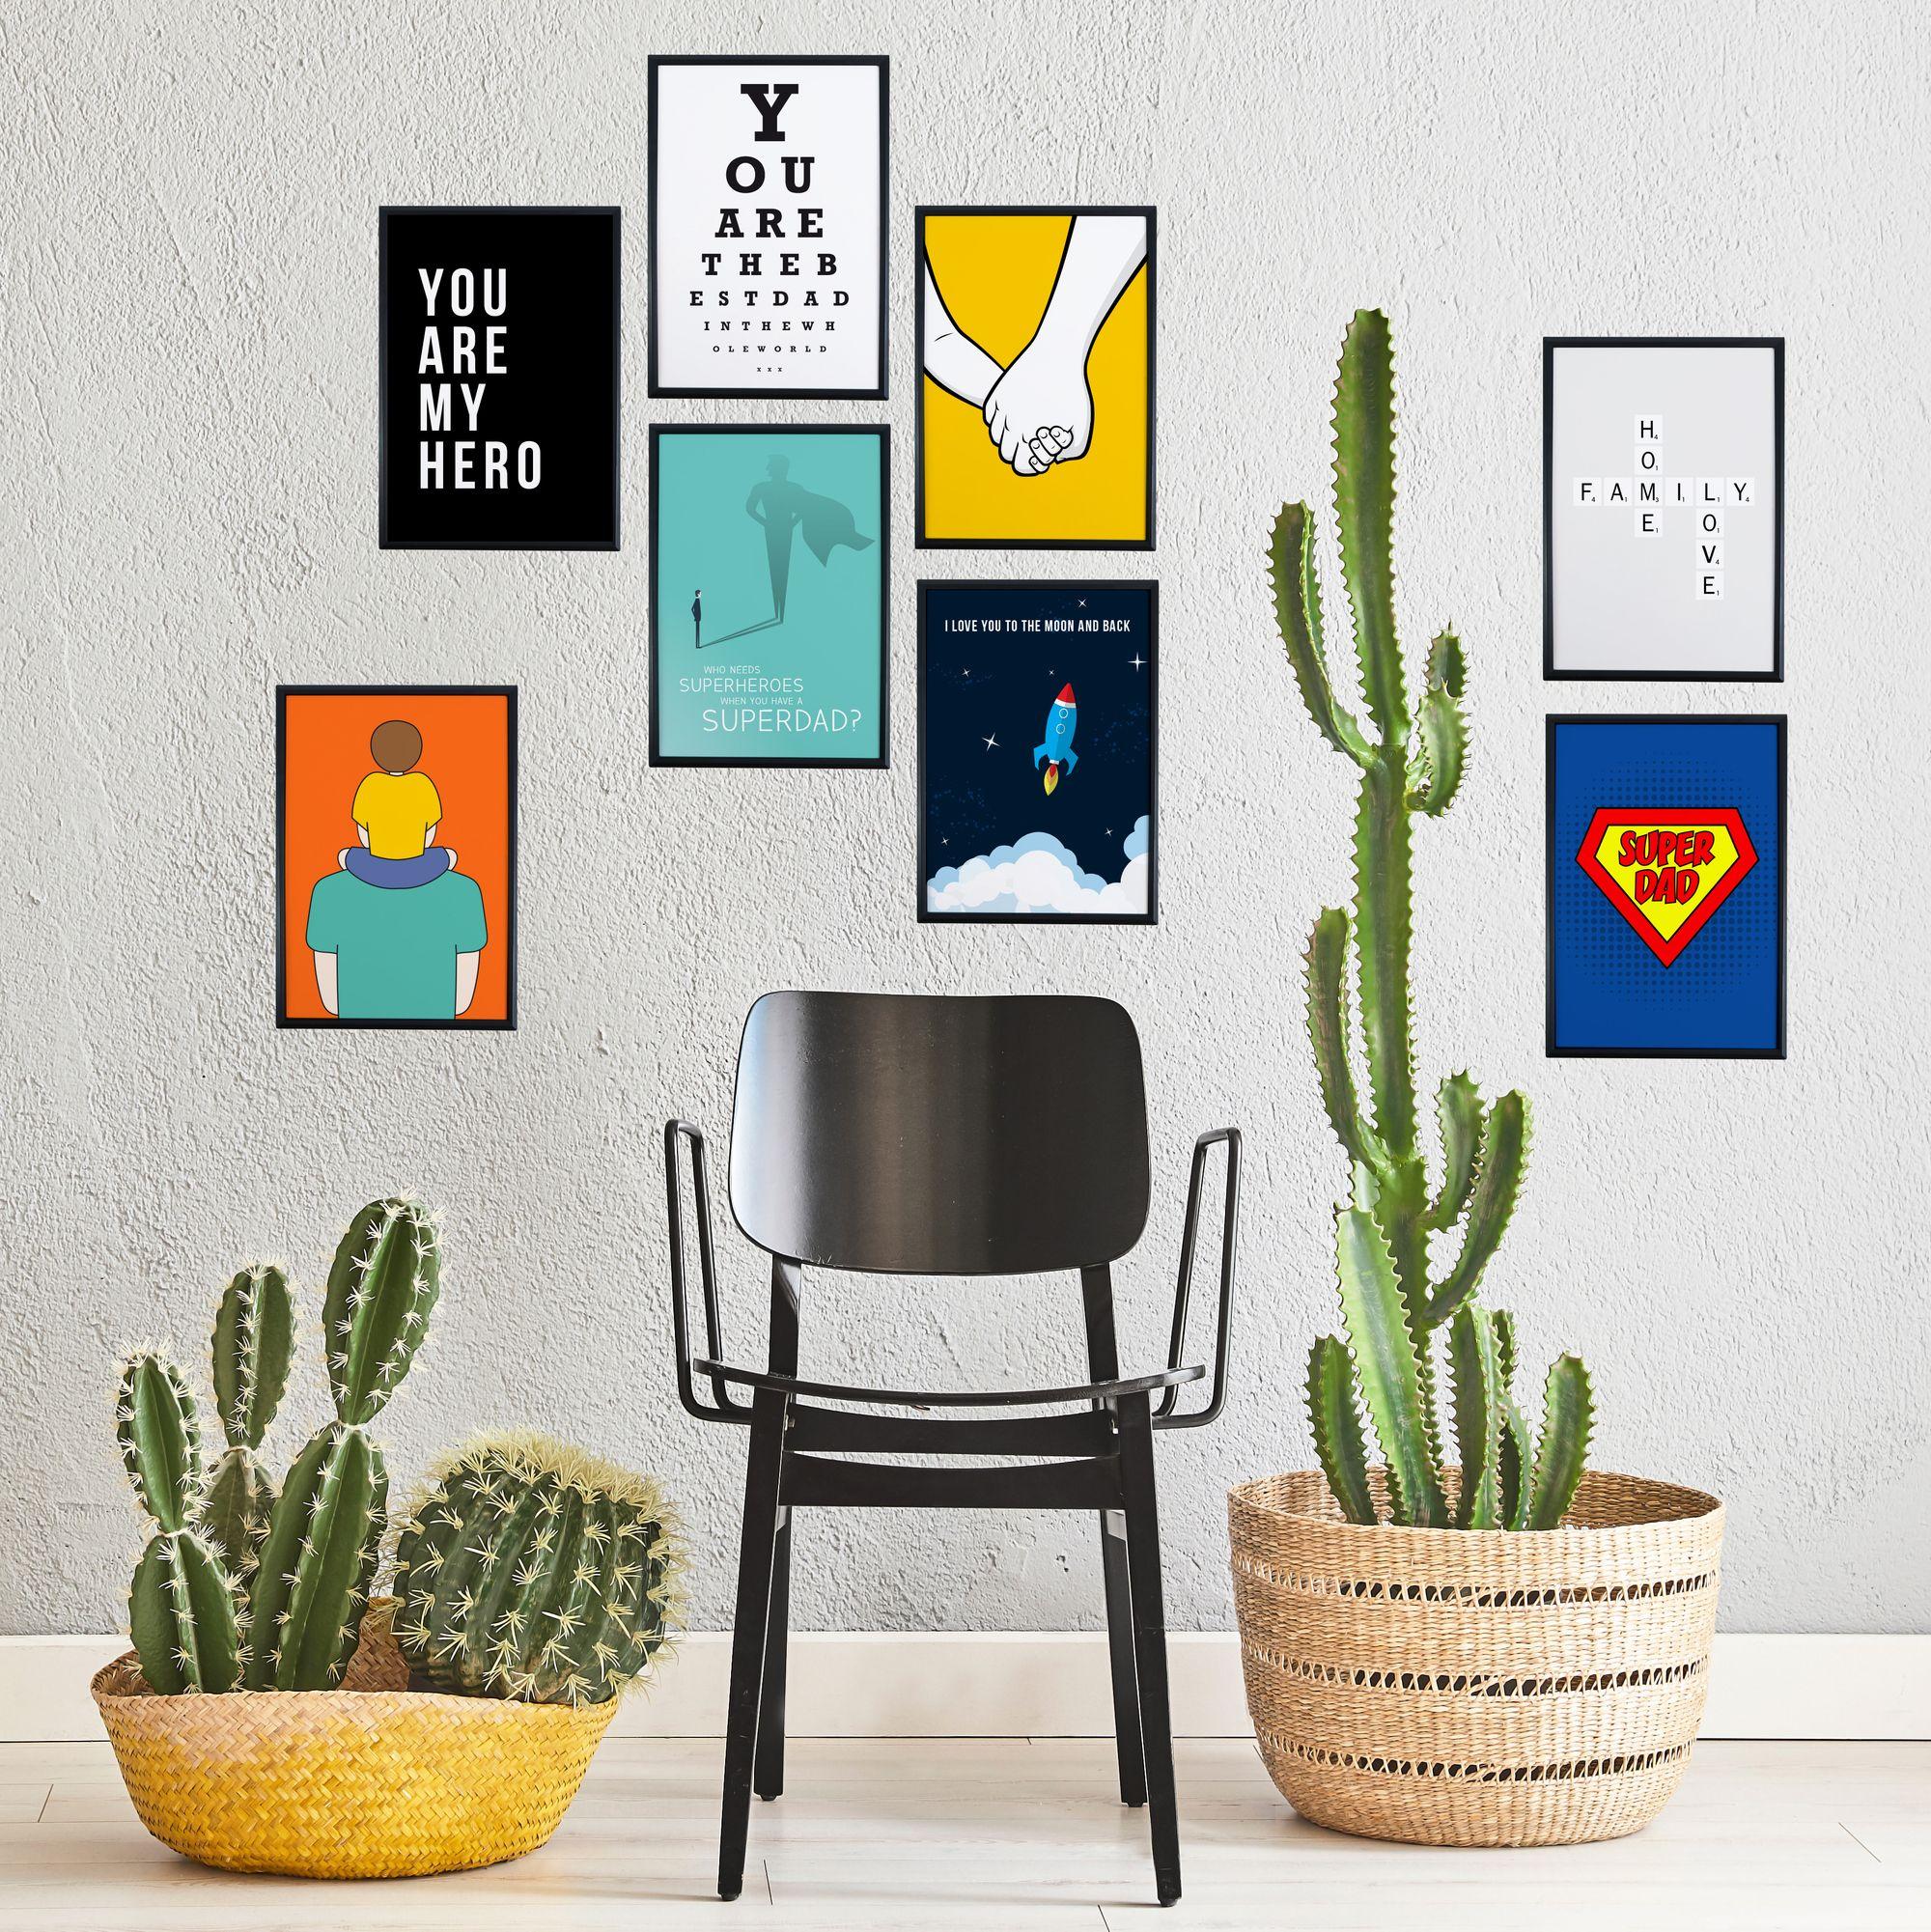 Poster Wall Art Bloompost Brievenbus Wanddecoratie Lijstjes Cadeau Muur Ideeen Brievenbus Wanden